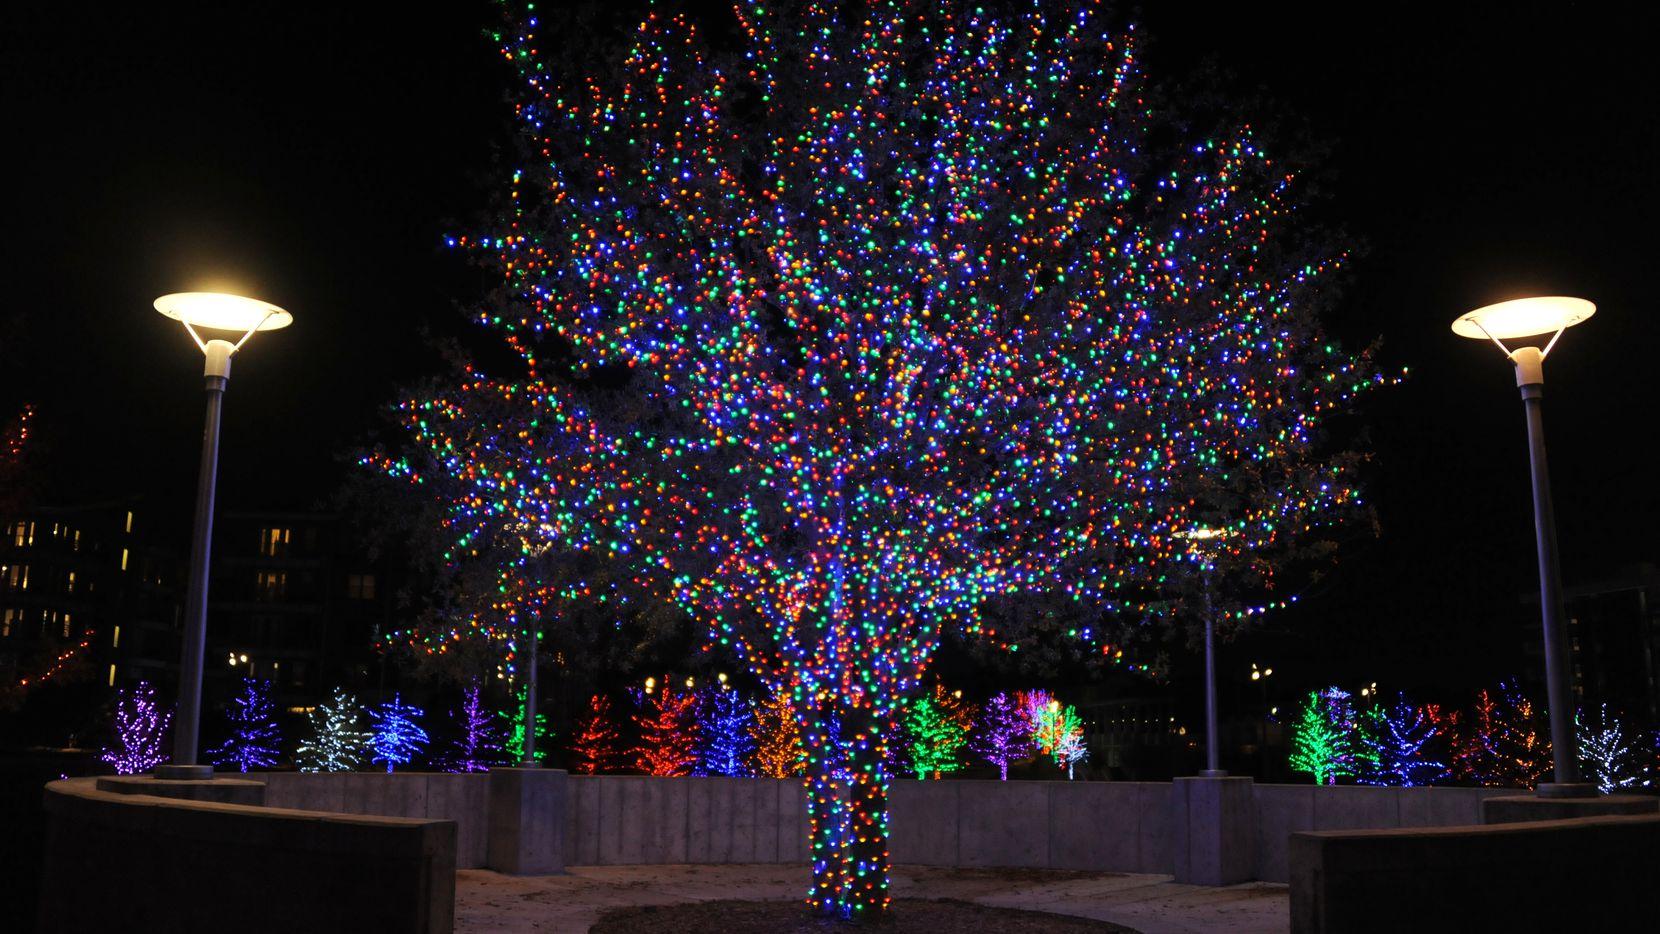 Vitruvian Park celebrates the holidays with a free festive light display.